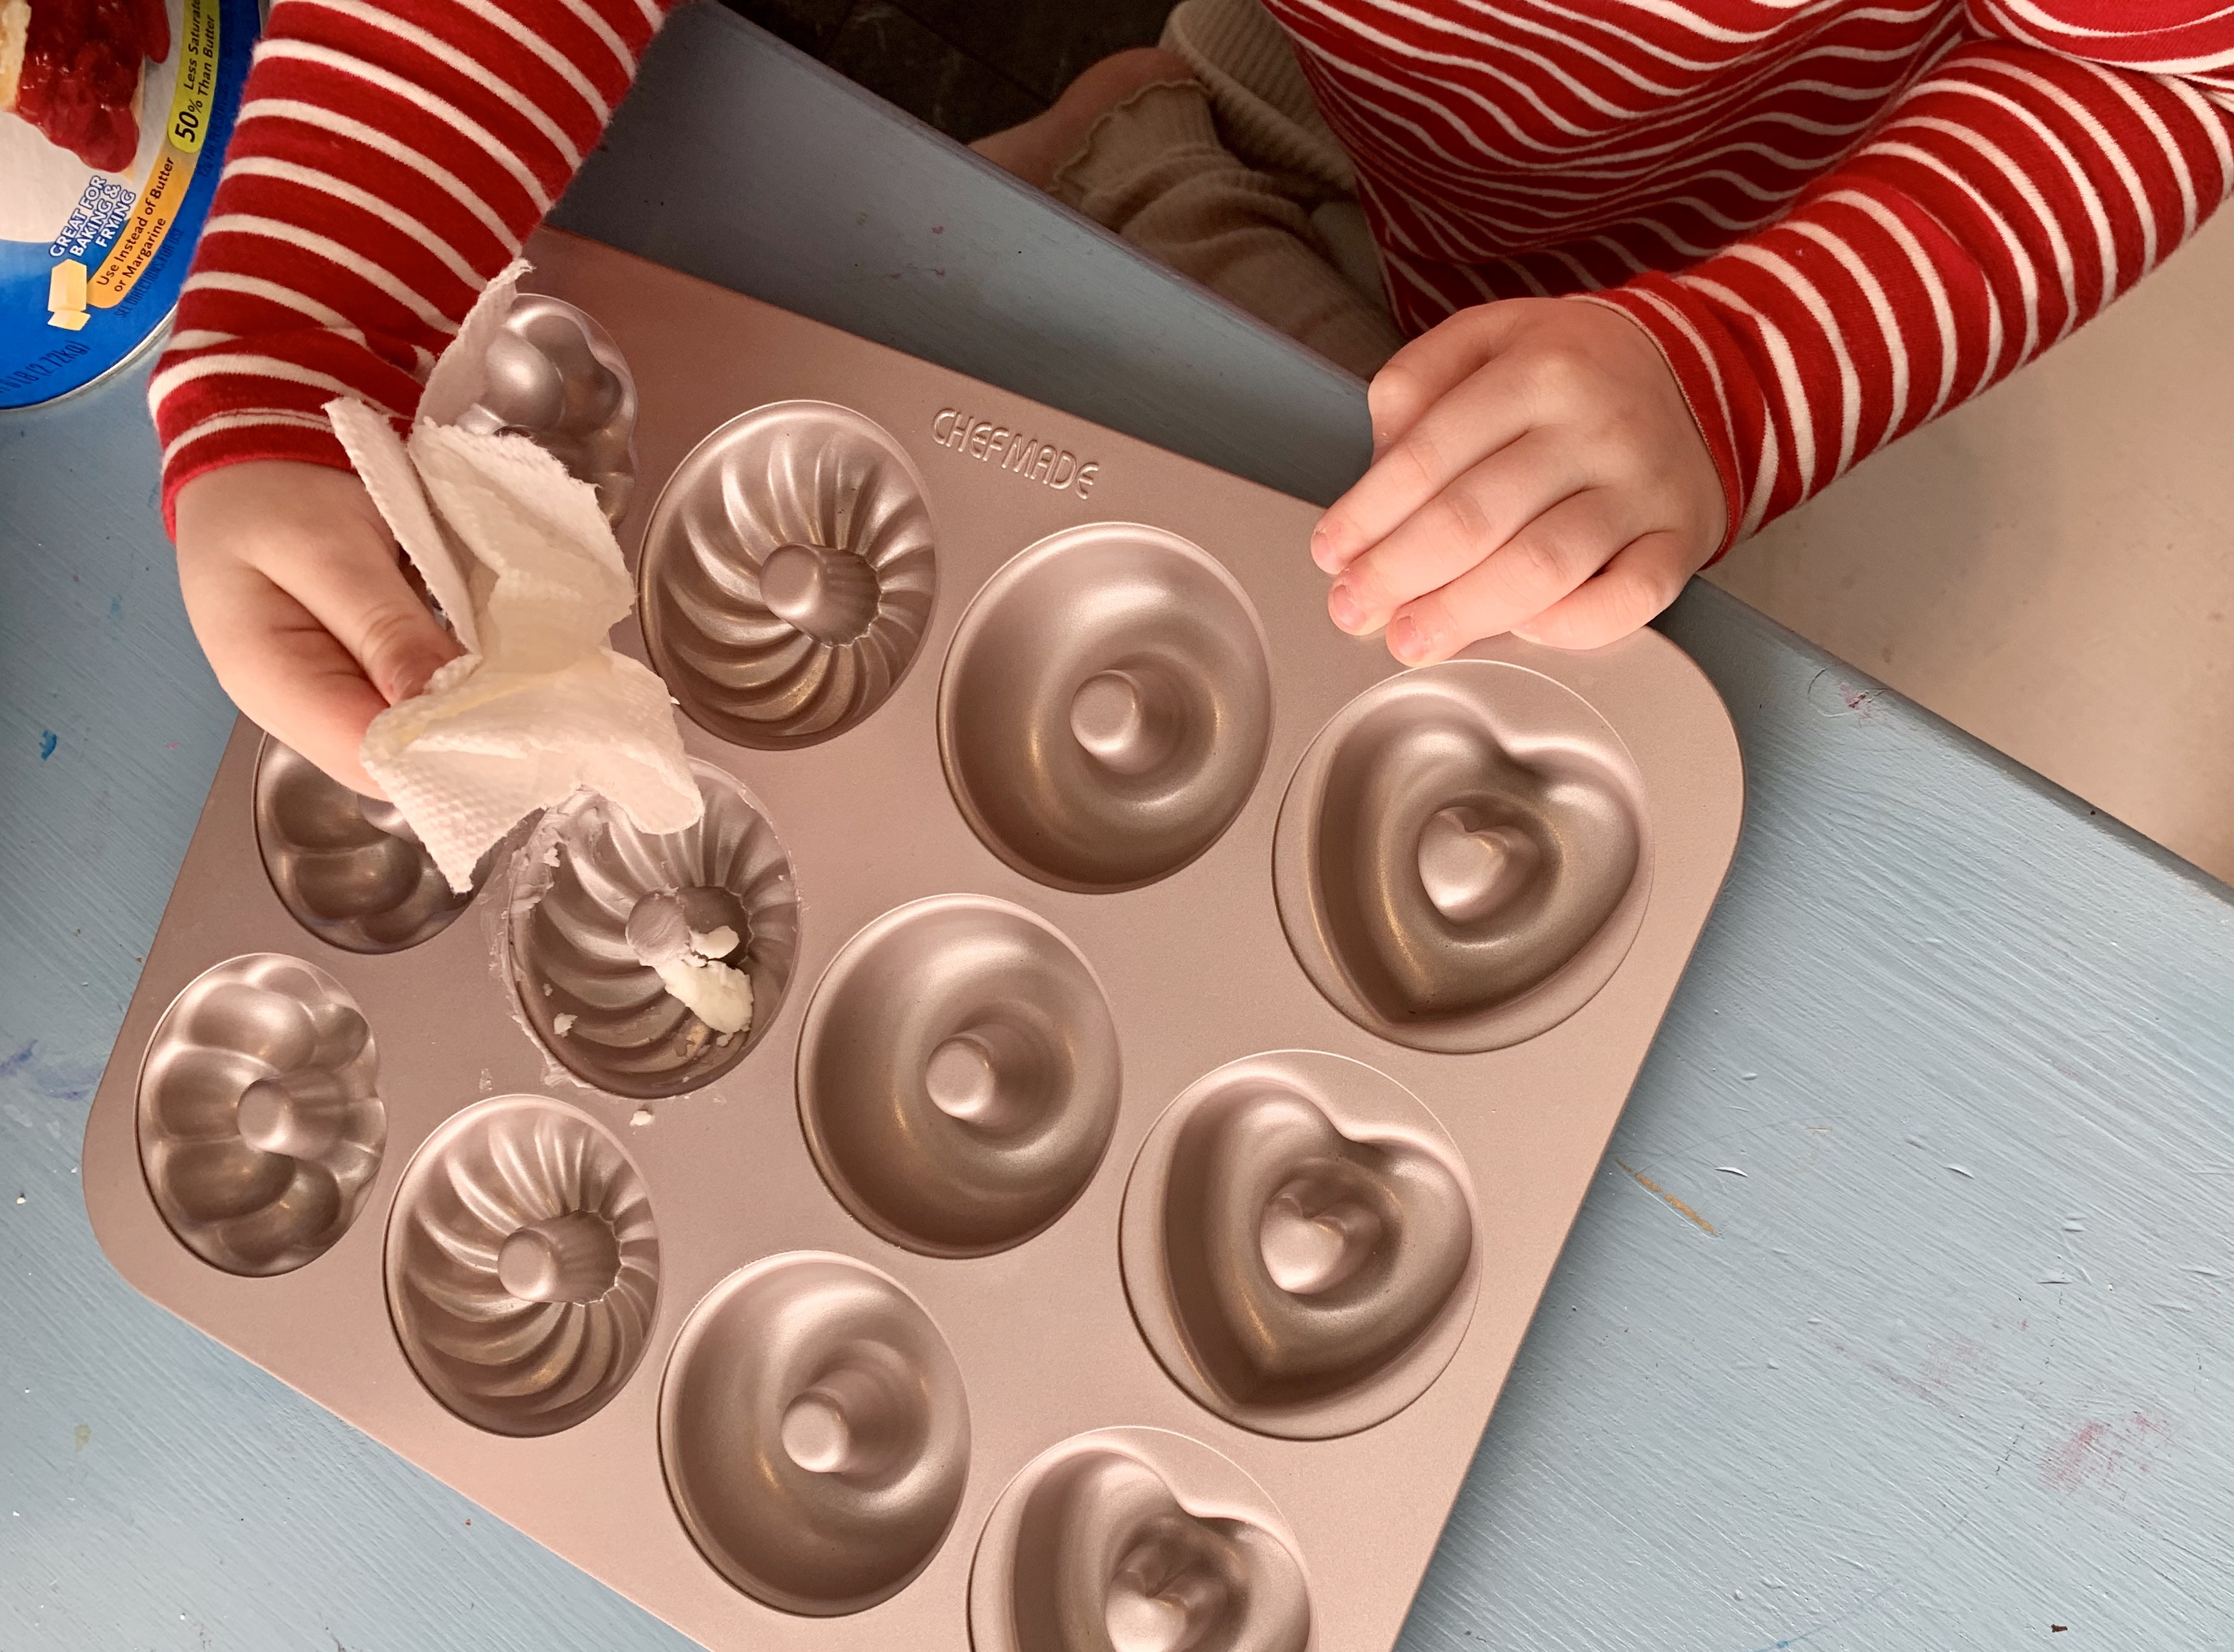 Greasing the doughnut pan